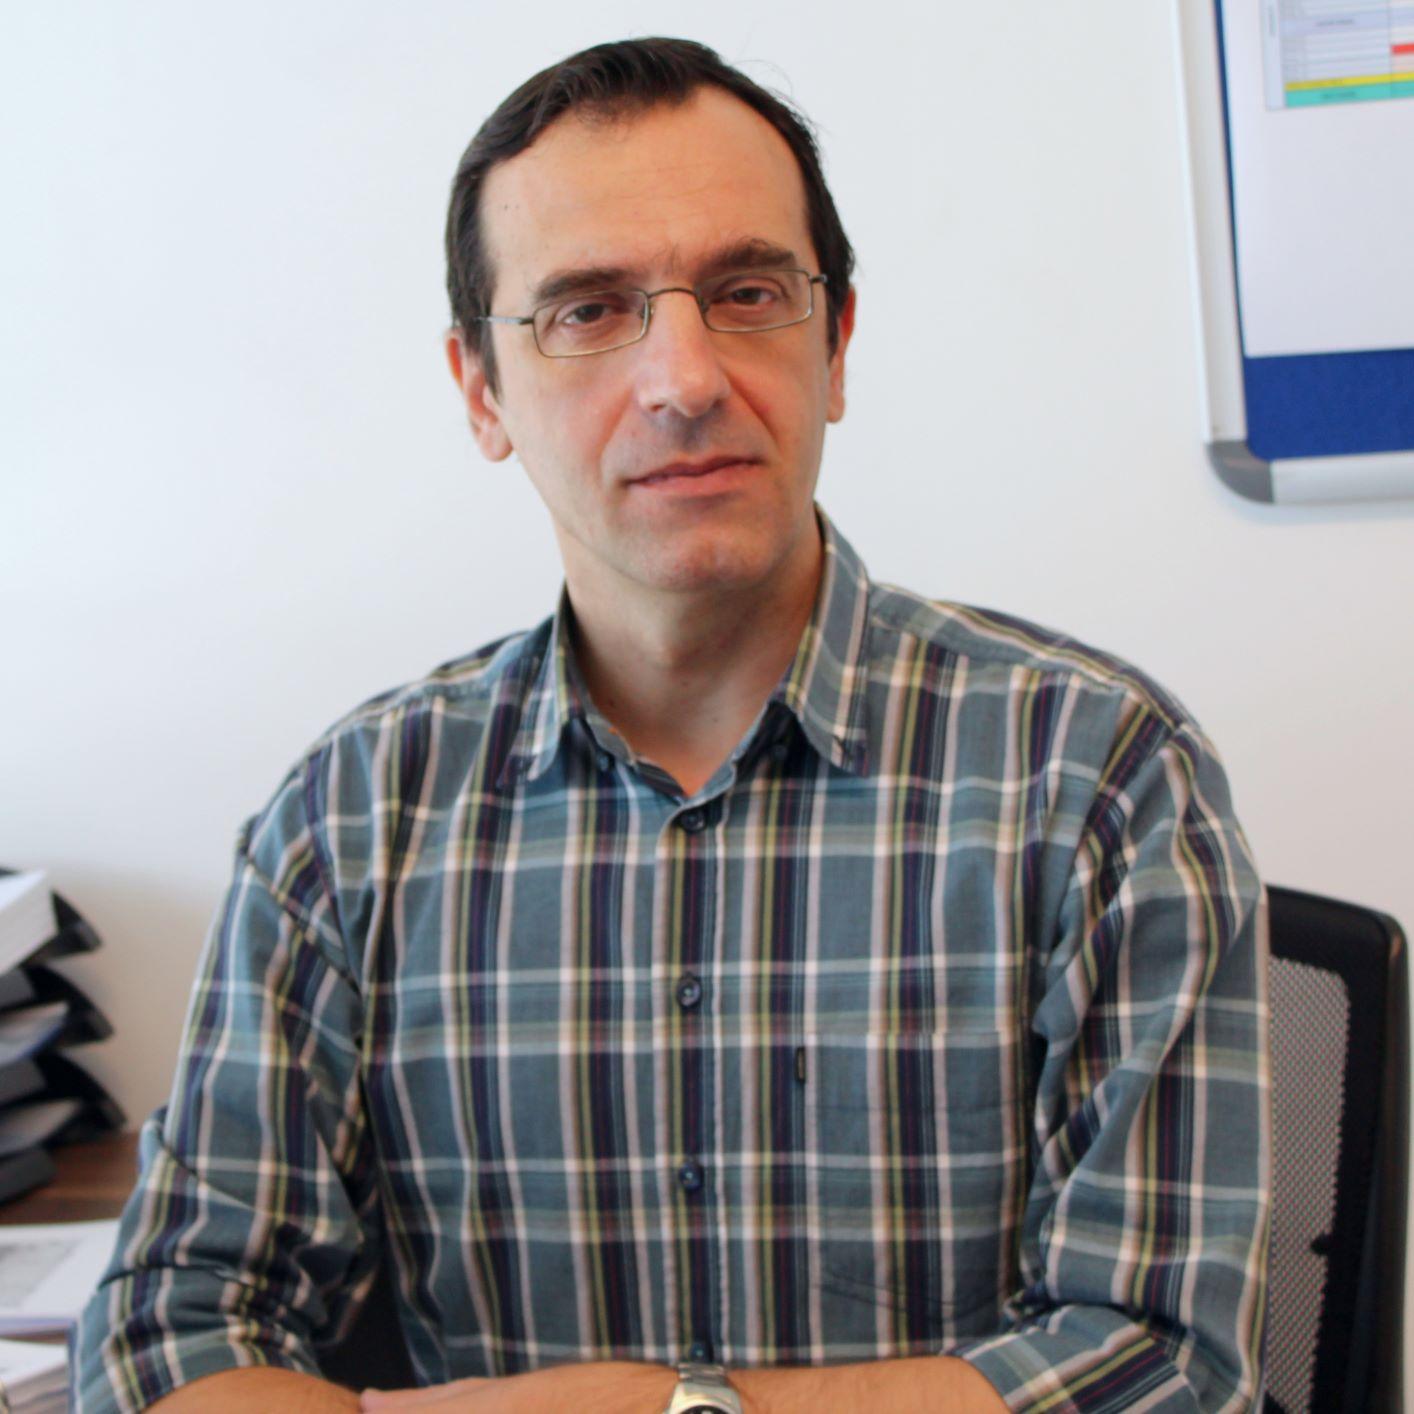 Dimitrios N. Kanakis